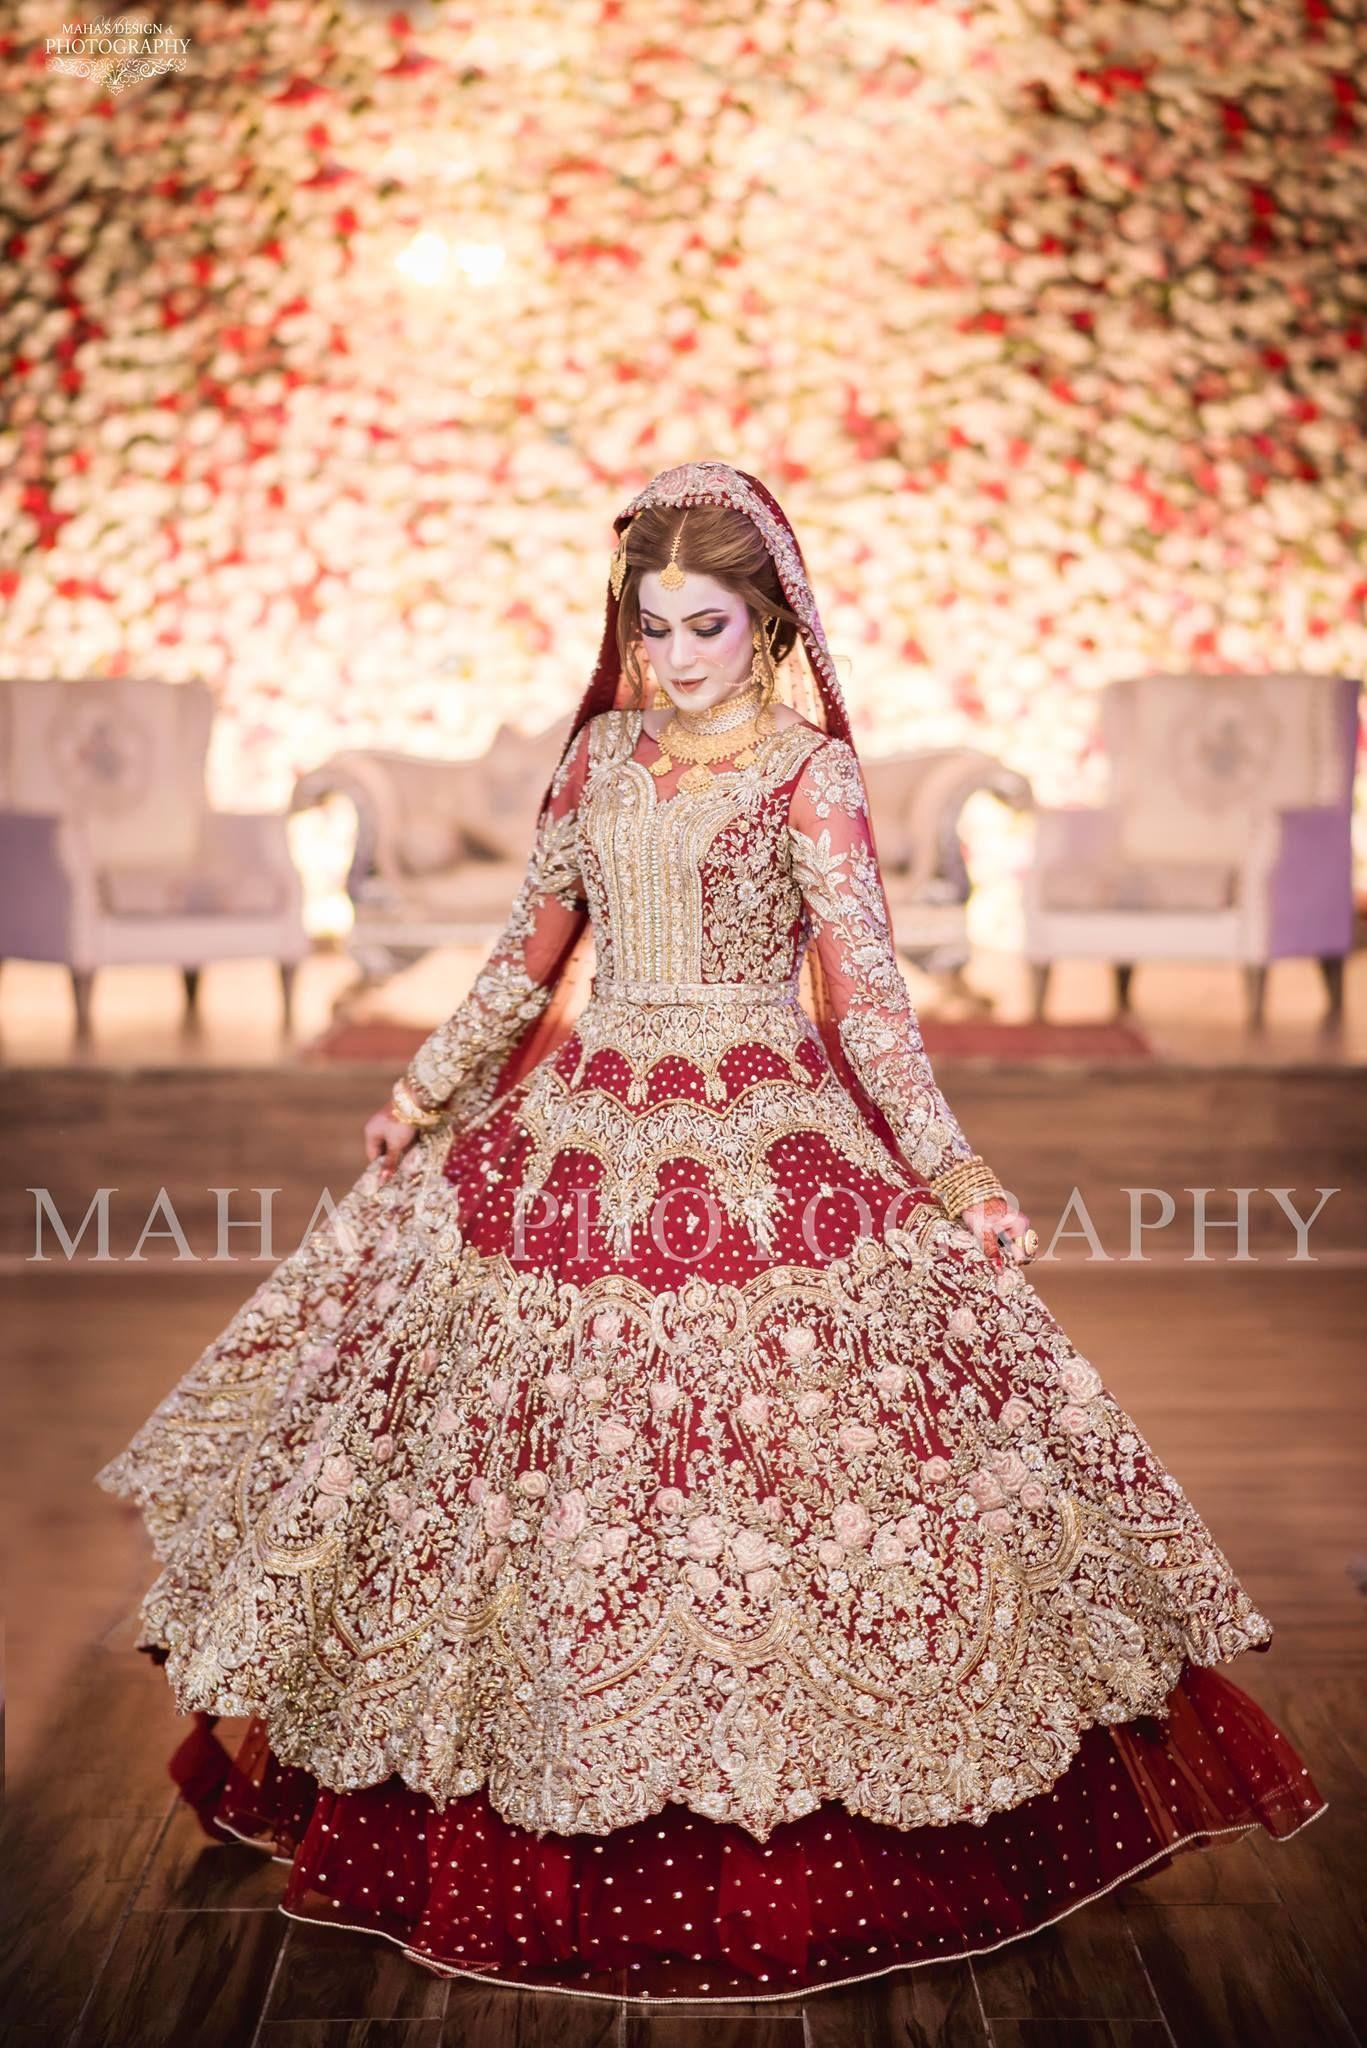 Dulhan Bridal Dress In Beutifull Maronish Red Color Model B 1790 Bridal Dresses Pakistan Red Bridal Dress Latest Bridal Dresses [ 2048 x 1367 Pixel ]